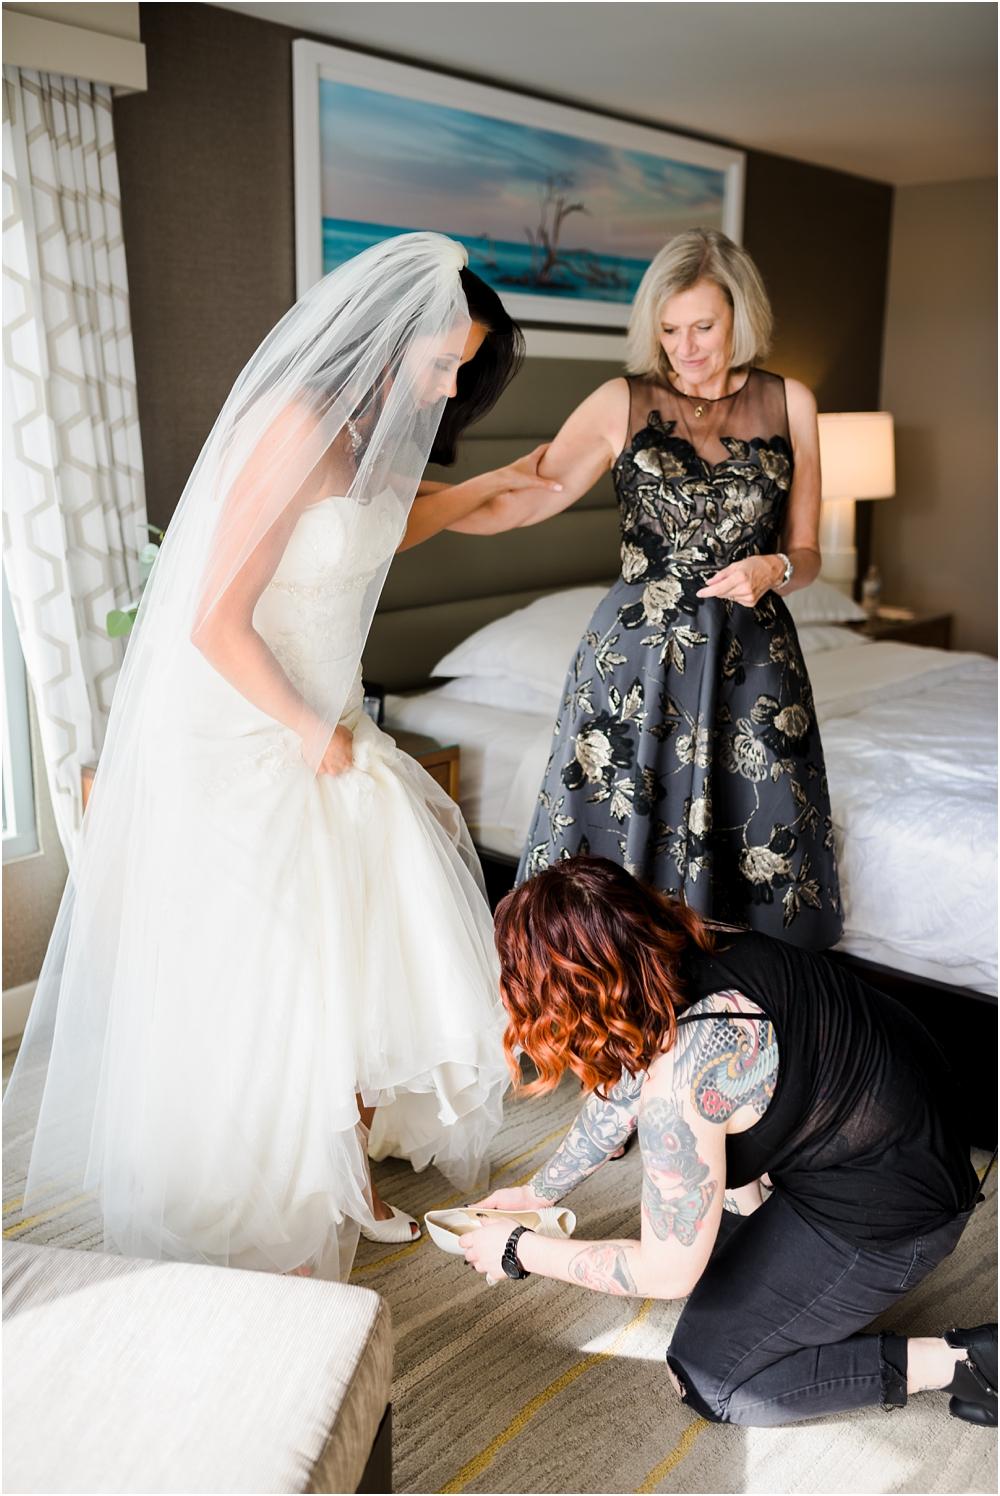 quinn-bay-point-sheraton-florida-wedding-photographer-kiersten-grant-26.jpg